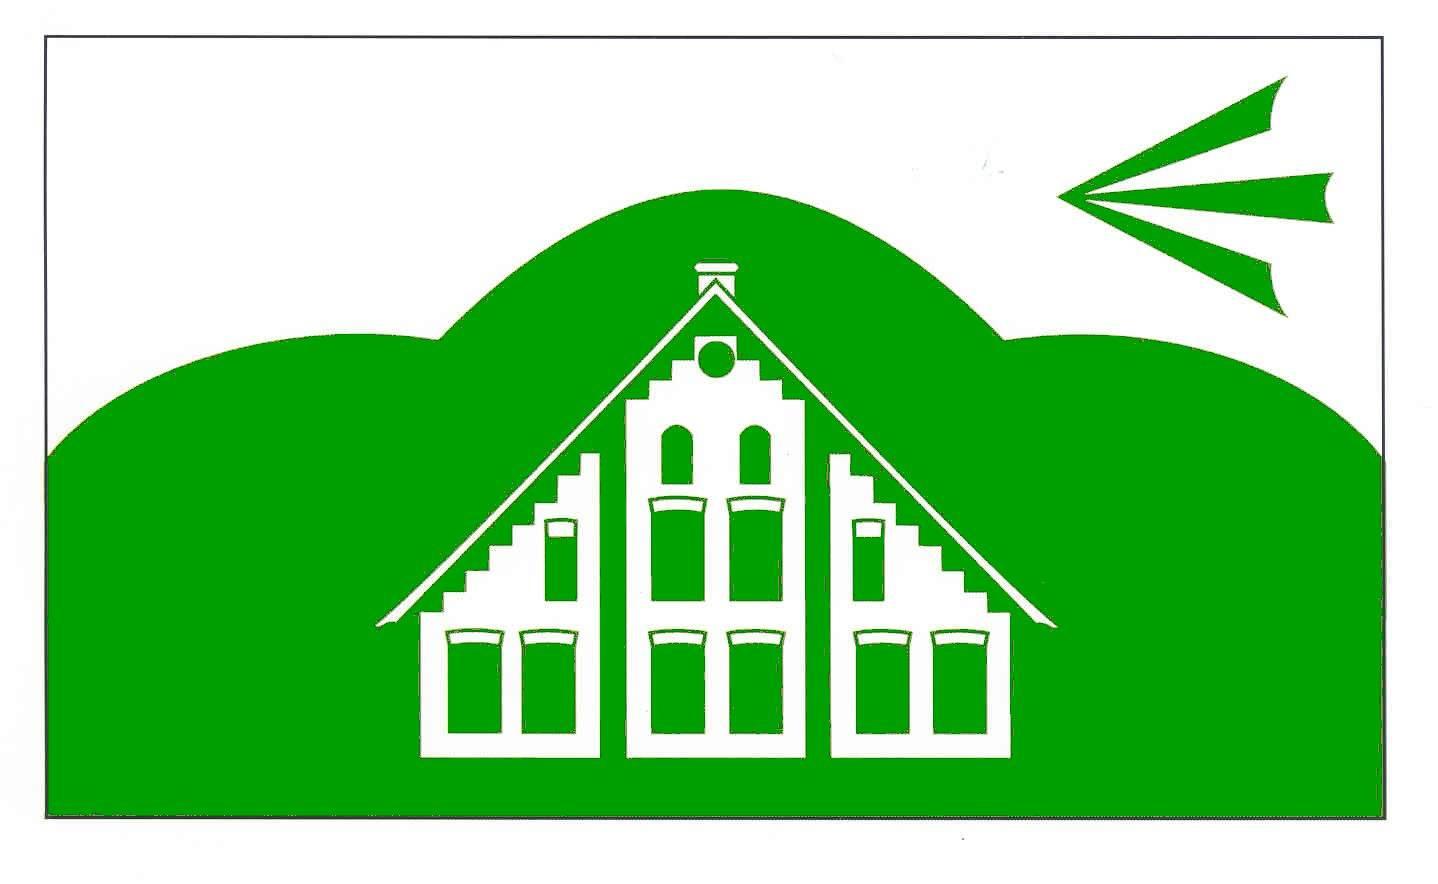 Flagge GemeindeBliestorf, Kreis Herzogtum Lauenburg